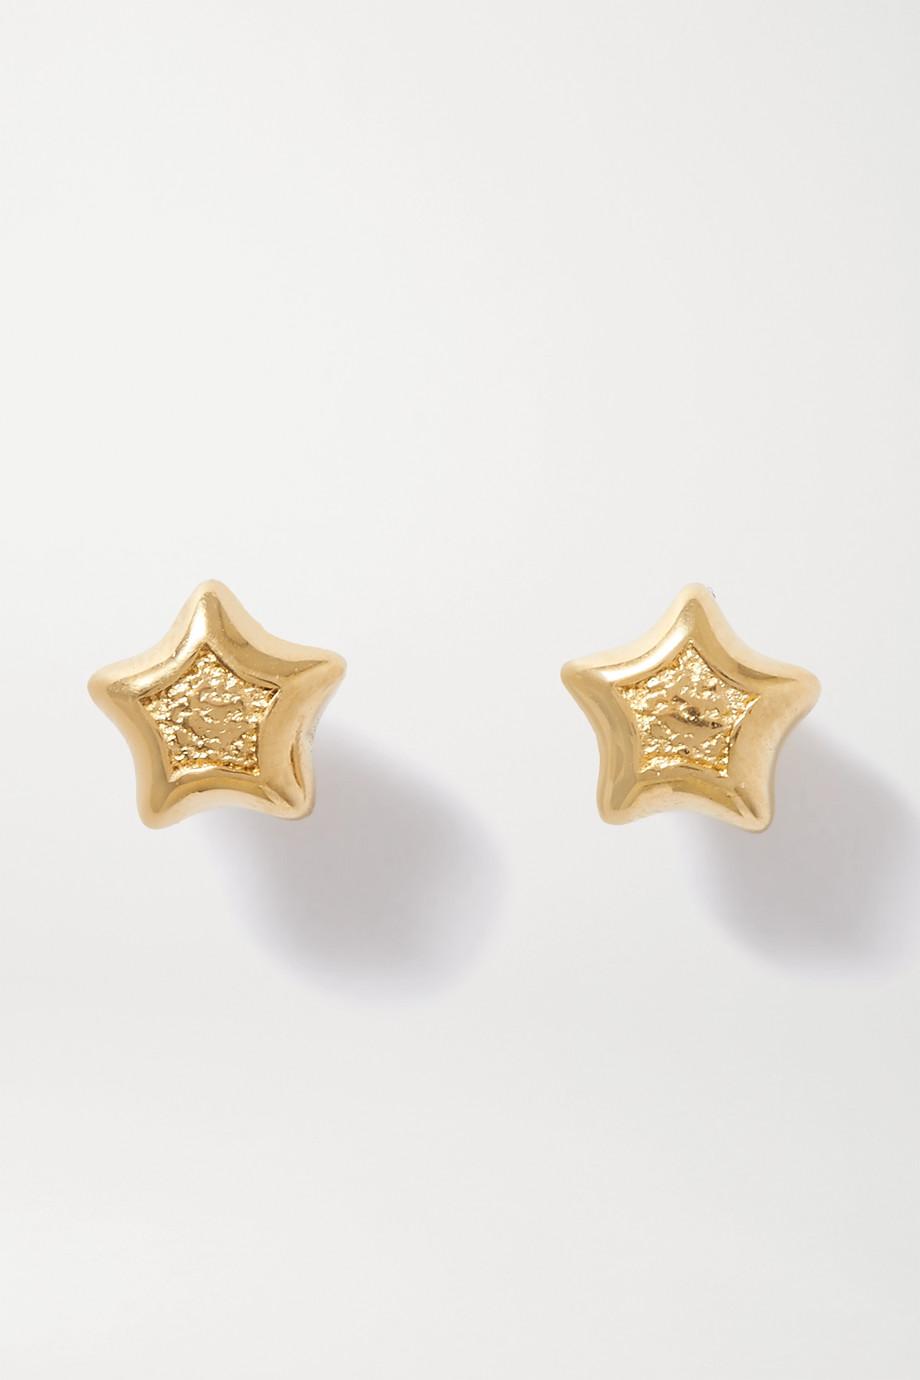 Bottega Veneta 金色耳环